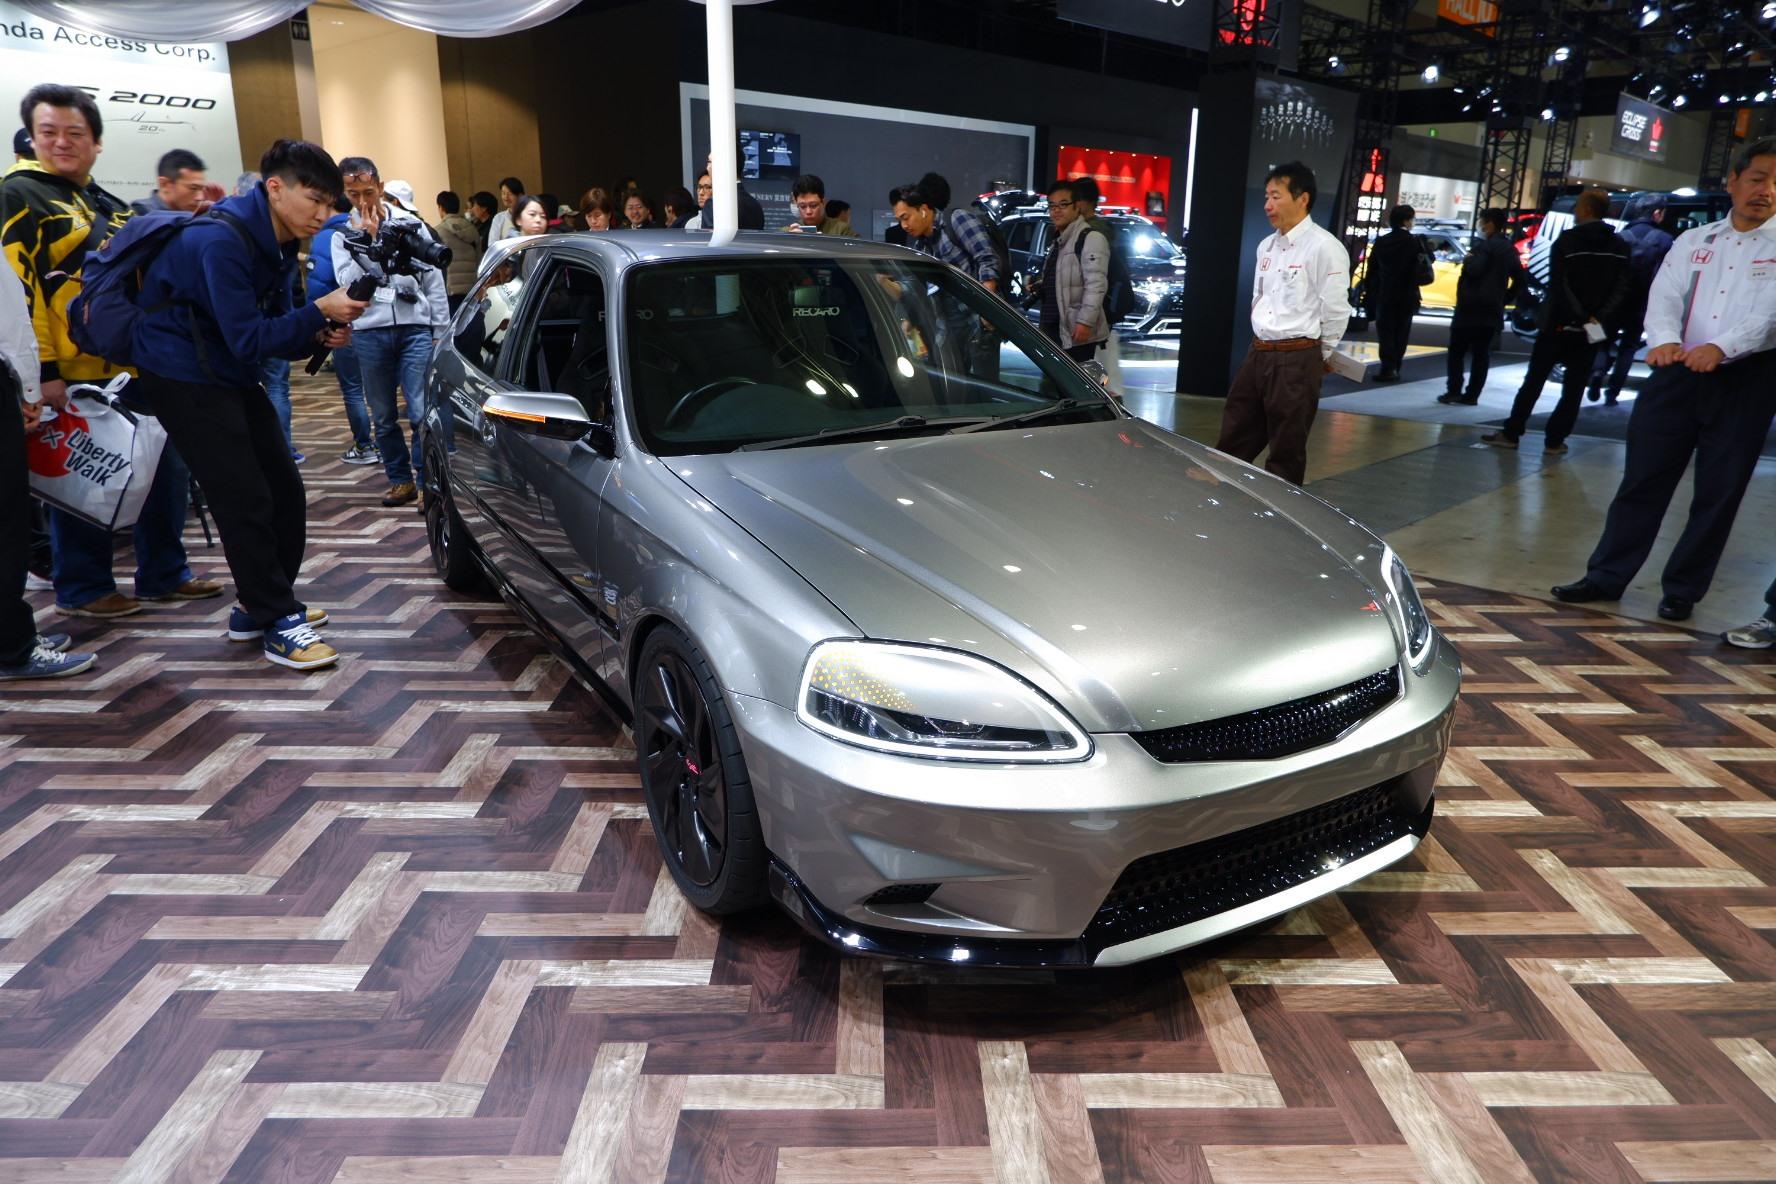 Honda_Civic_Cyber_Night_Japan_Cruiser_2020_0006